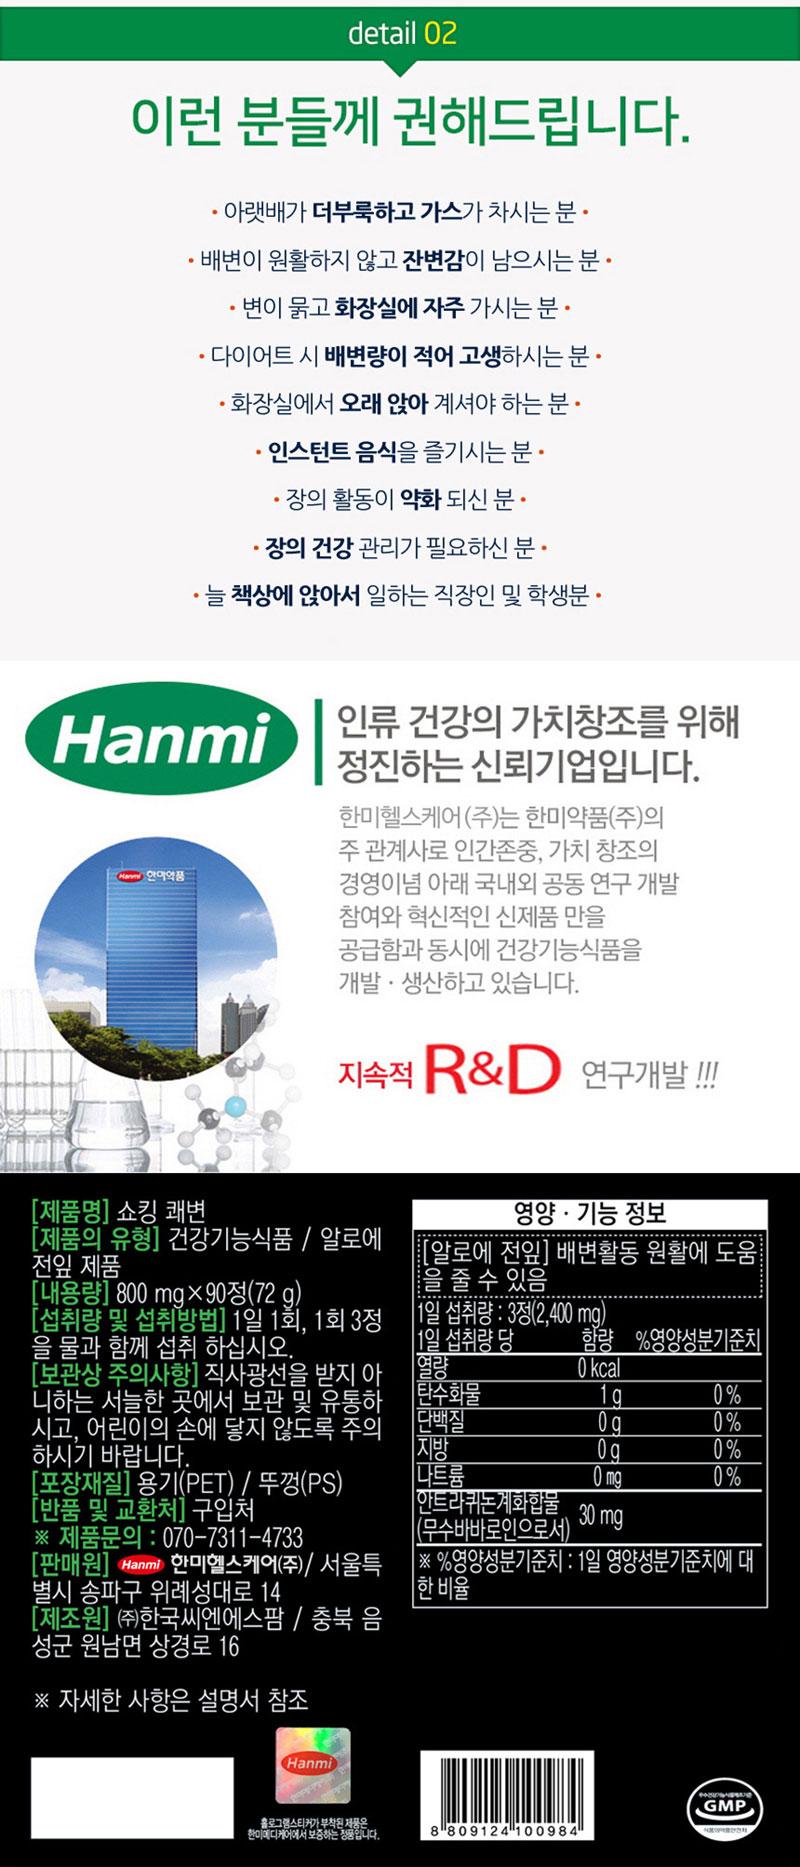 Hanmi-Showking_good_bowel_detail_800_4.jpg